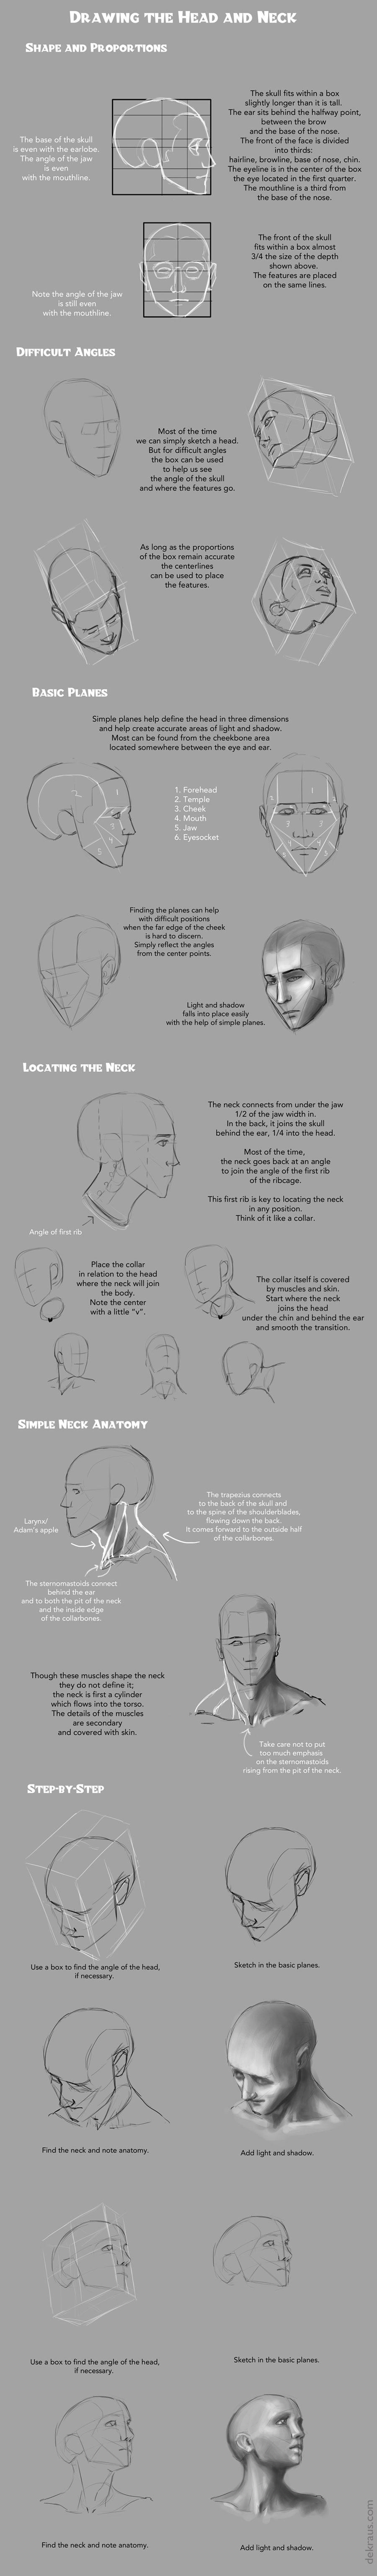 Drawing Heads and Necks Tutorial by banjodi